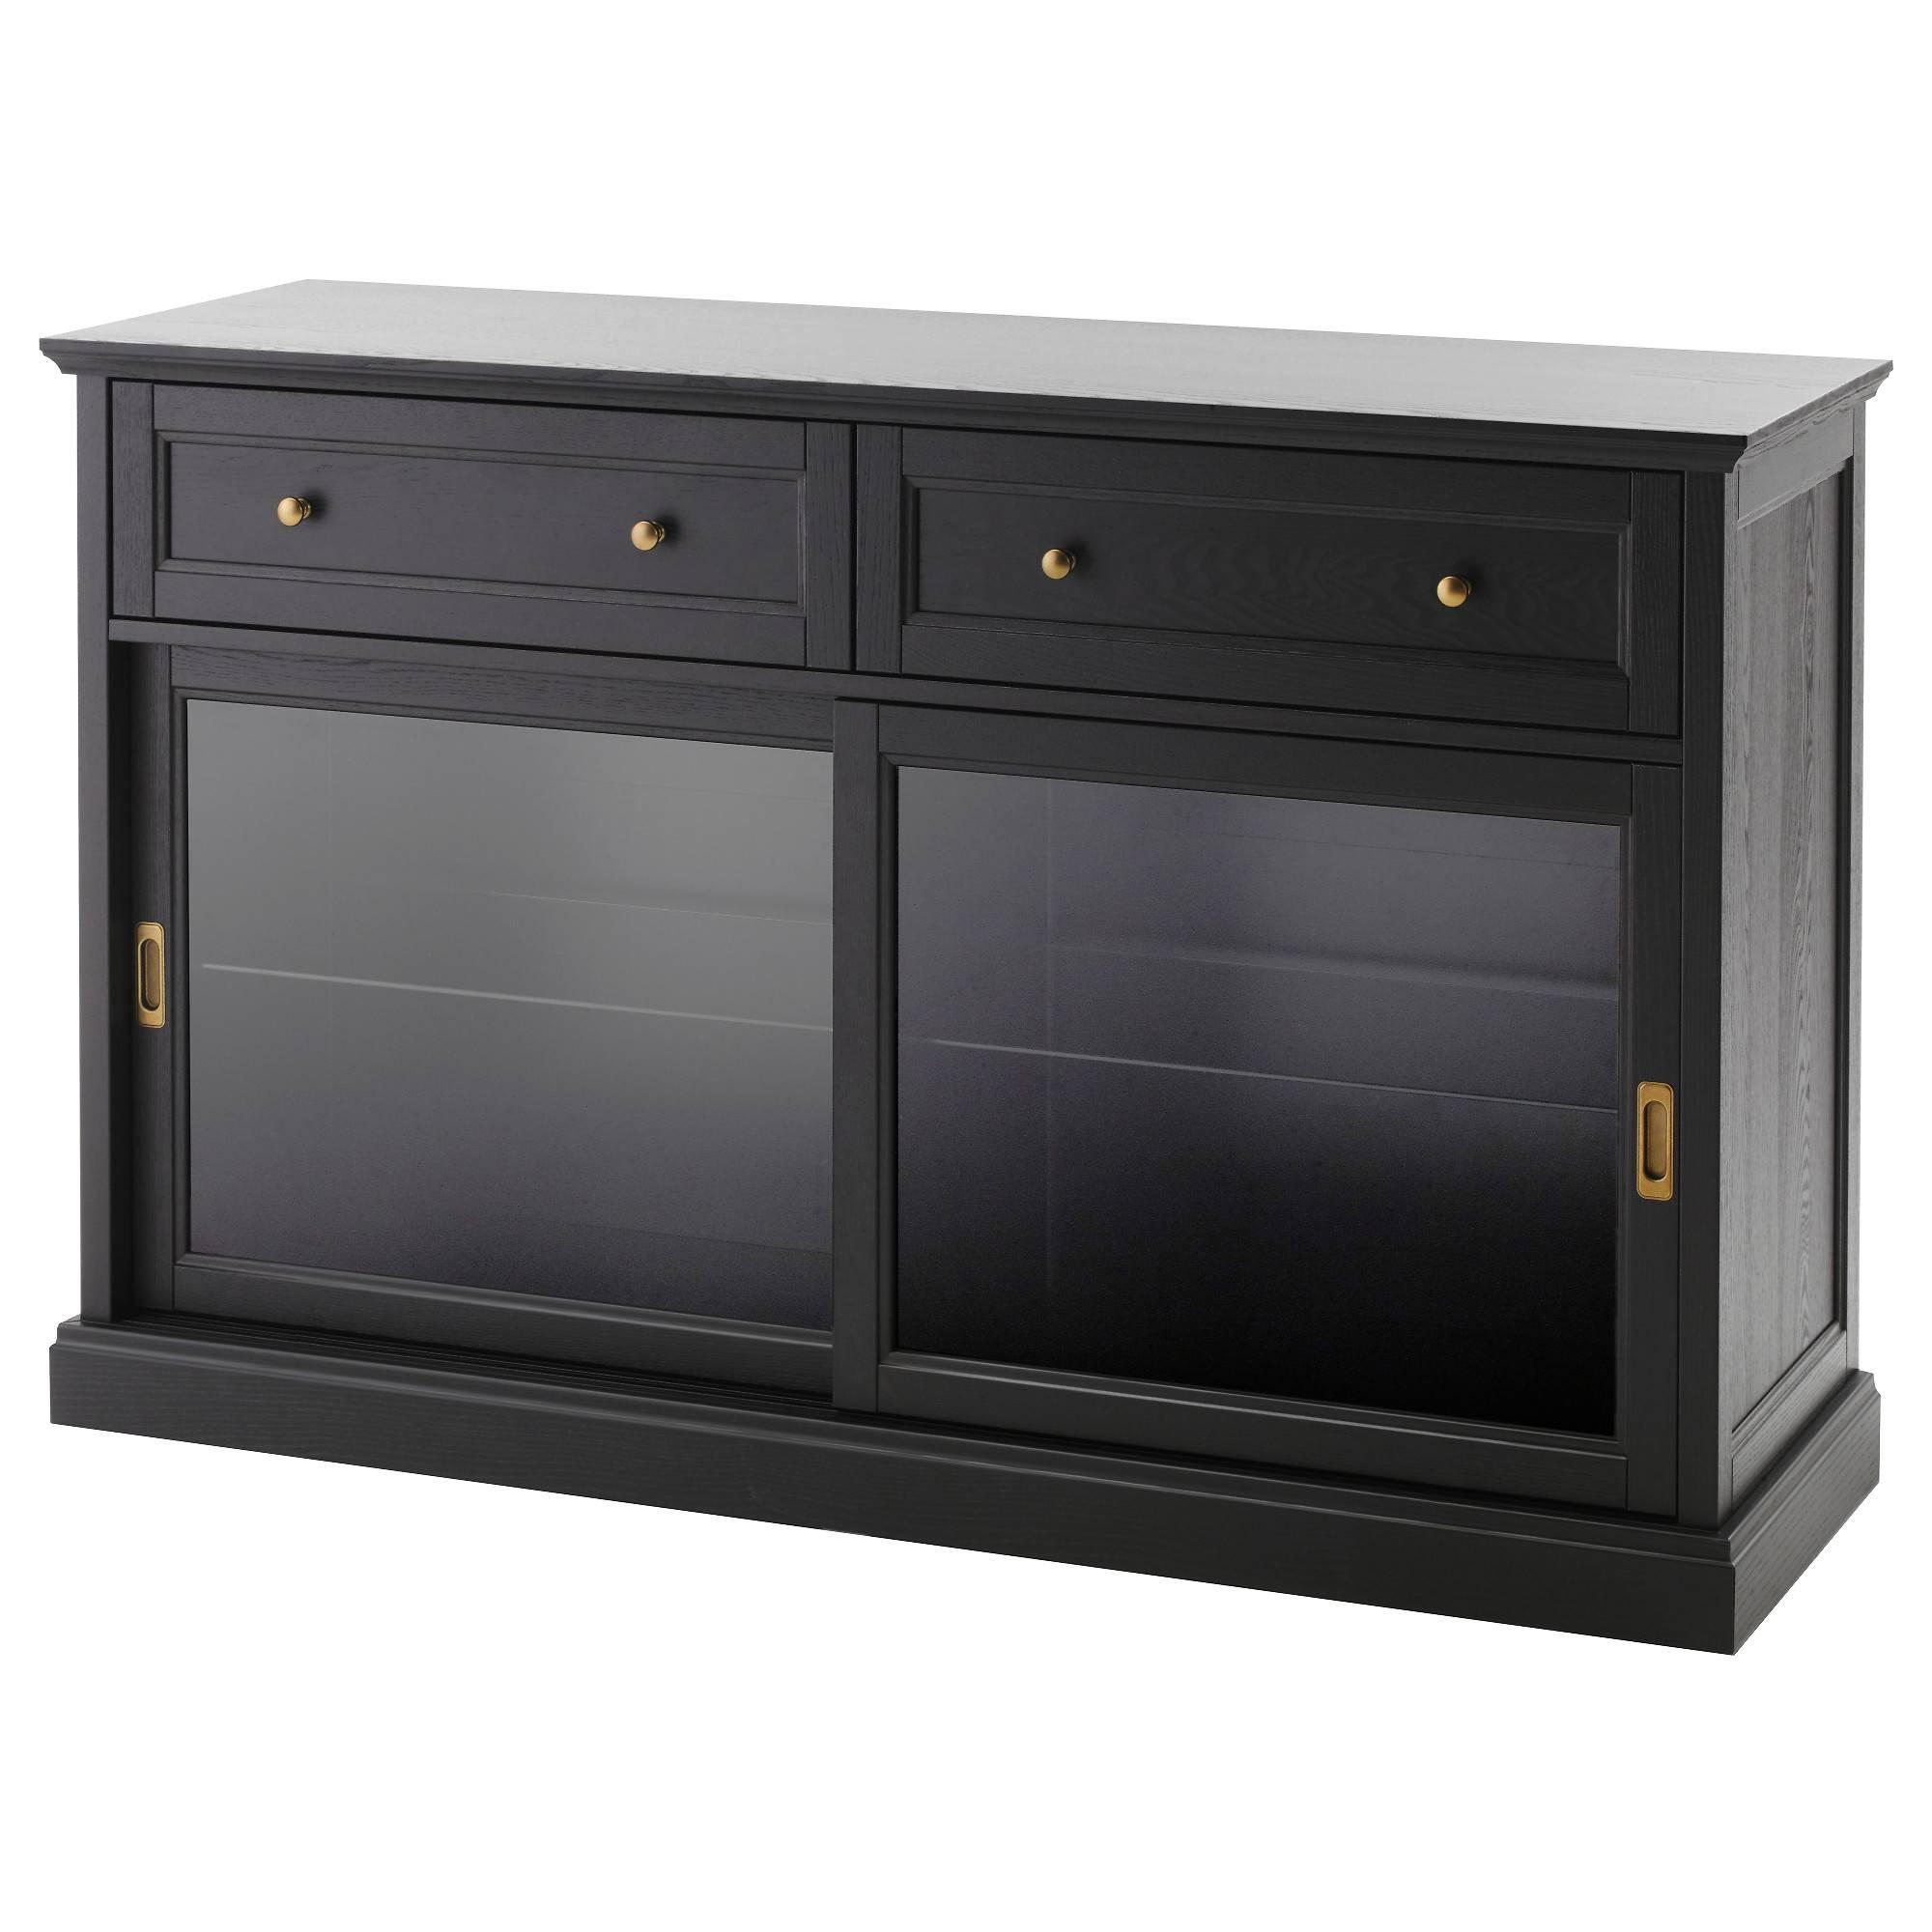 Sideboards & Buffet Cabinets | Ikea Regarding Small Black Sideboards (#8 of 20)